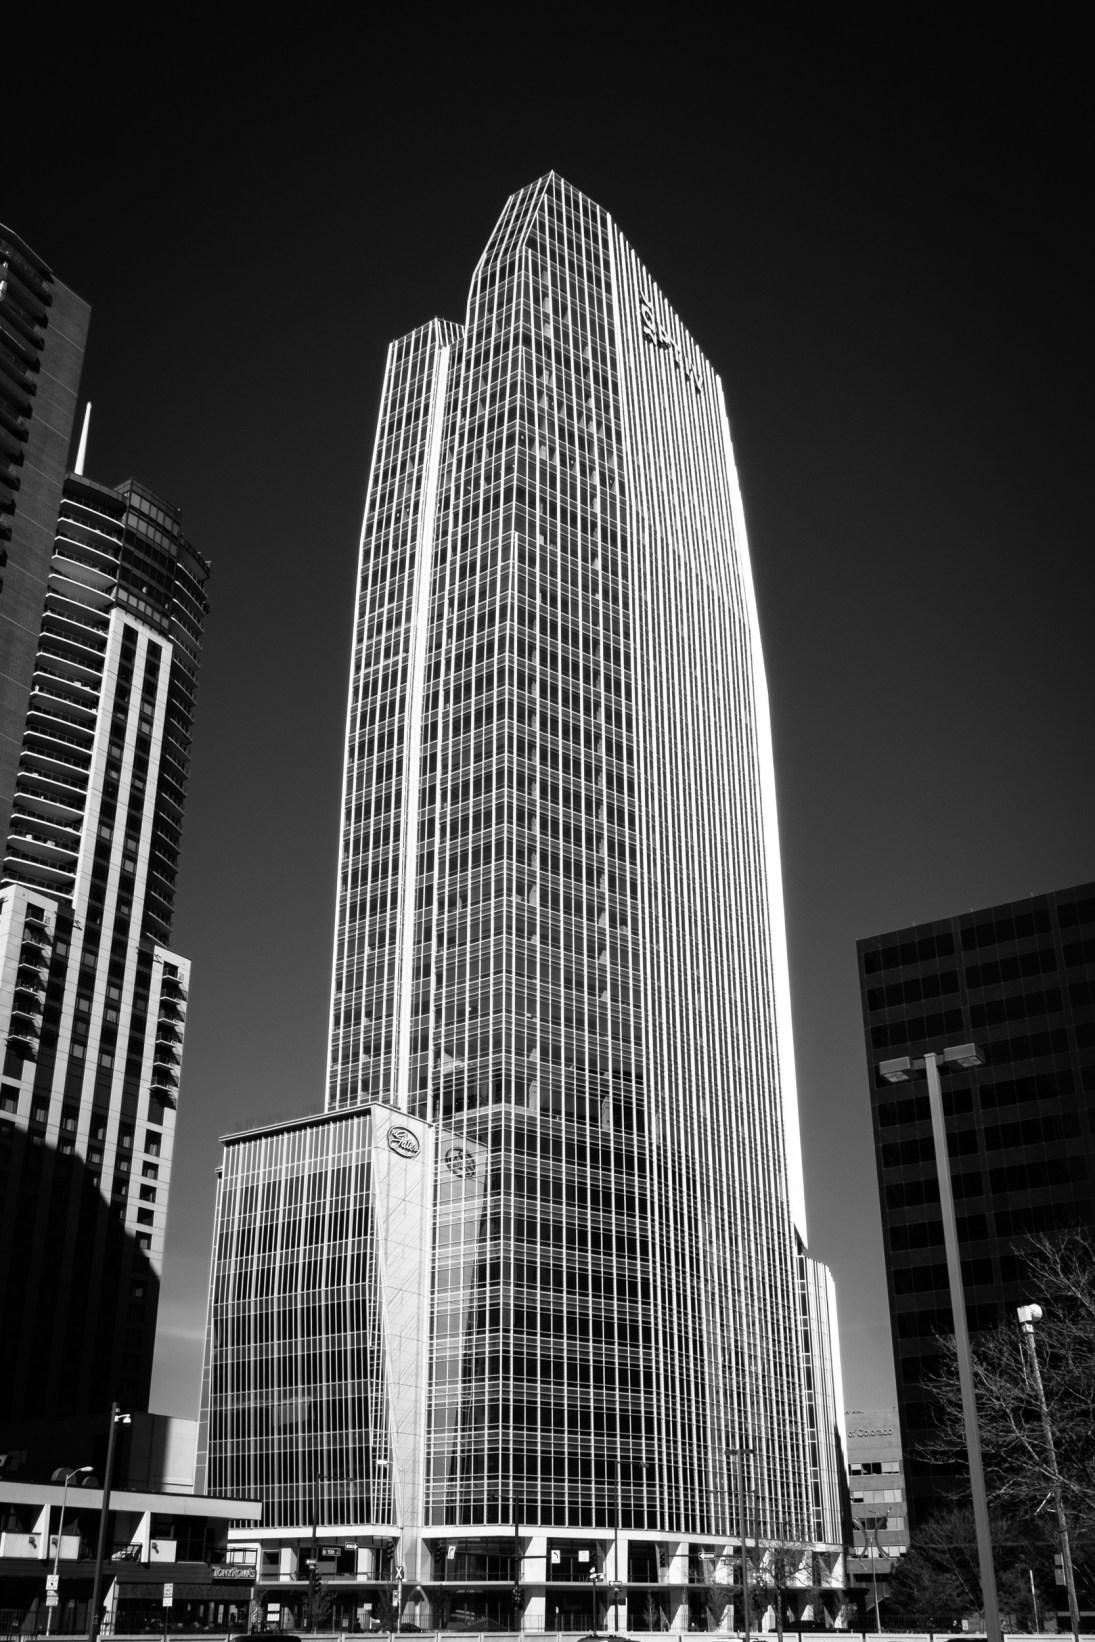 1144 15th Street, Denver, Colorado. Copyright © 2018 Gary Allman, all rights reserved.